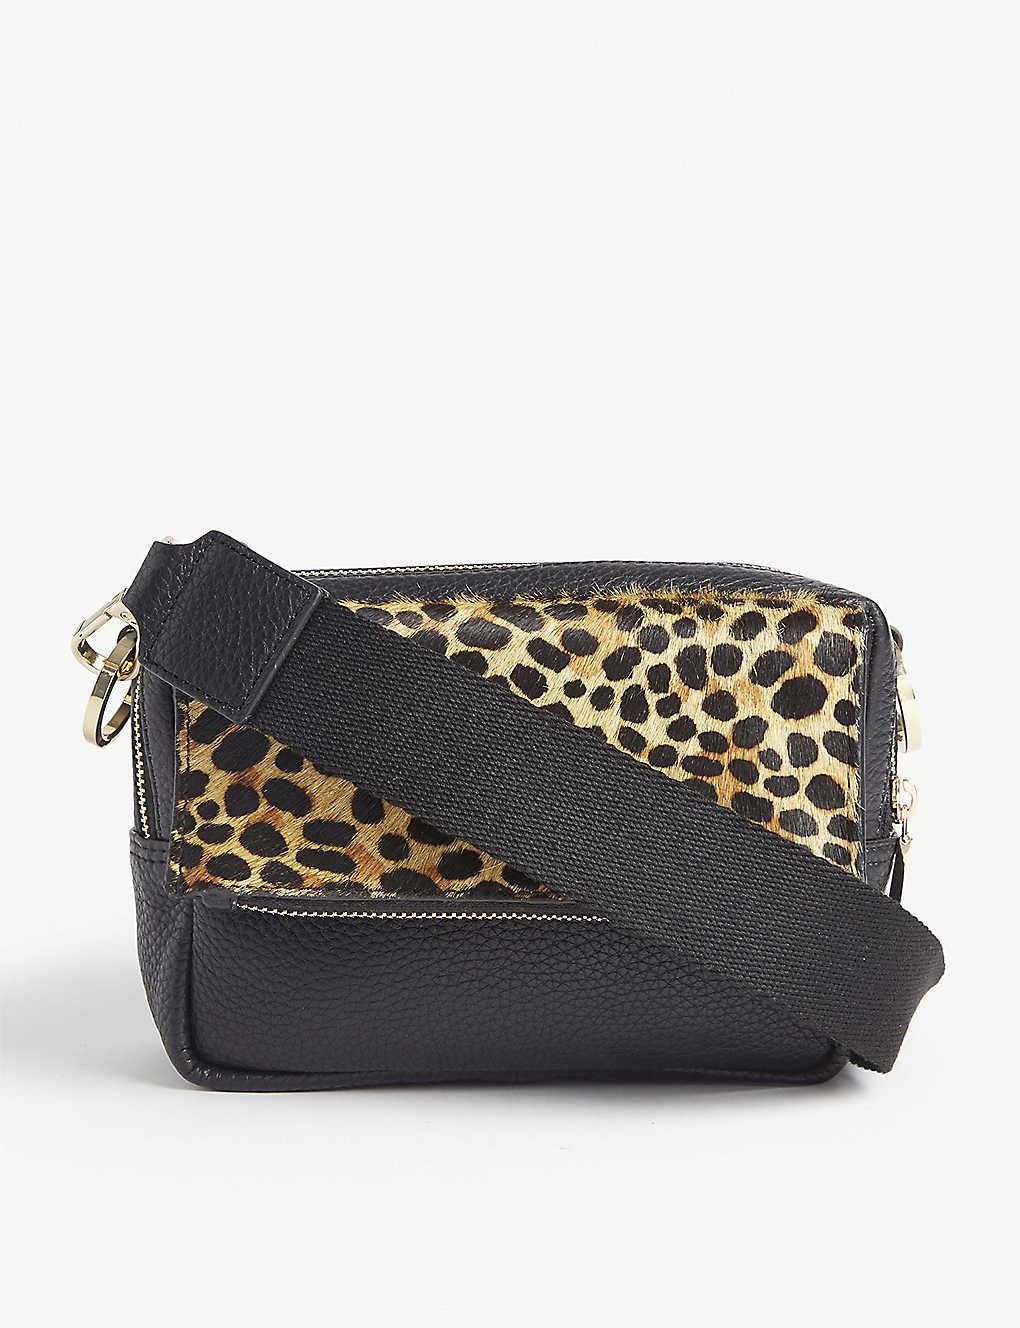 362efae4543d WHISTLES - Bibi leopard-print leather cross-body bag | Selfridges.com